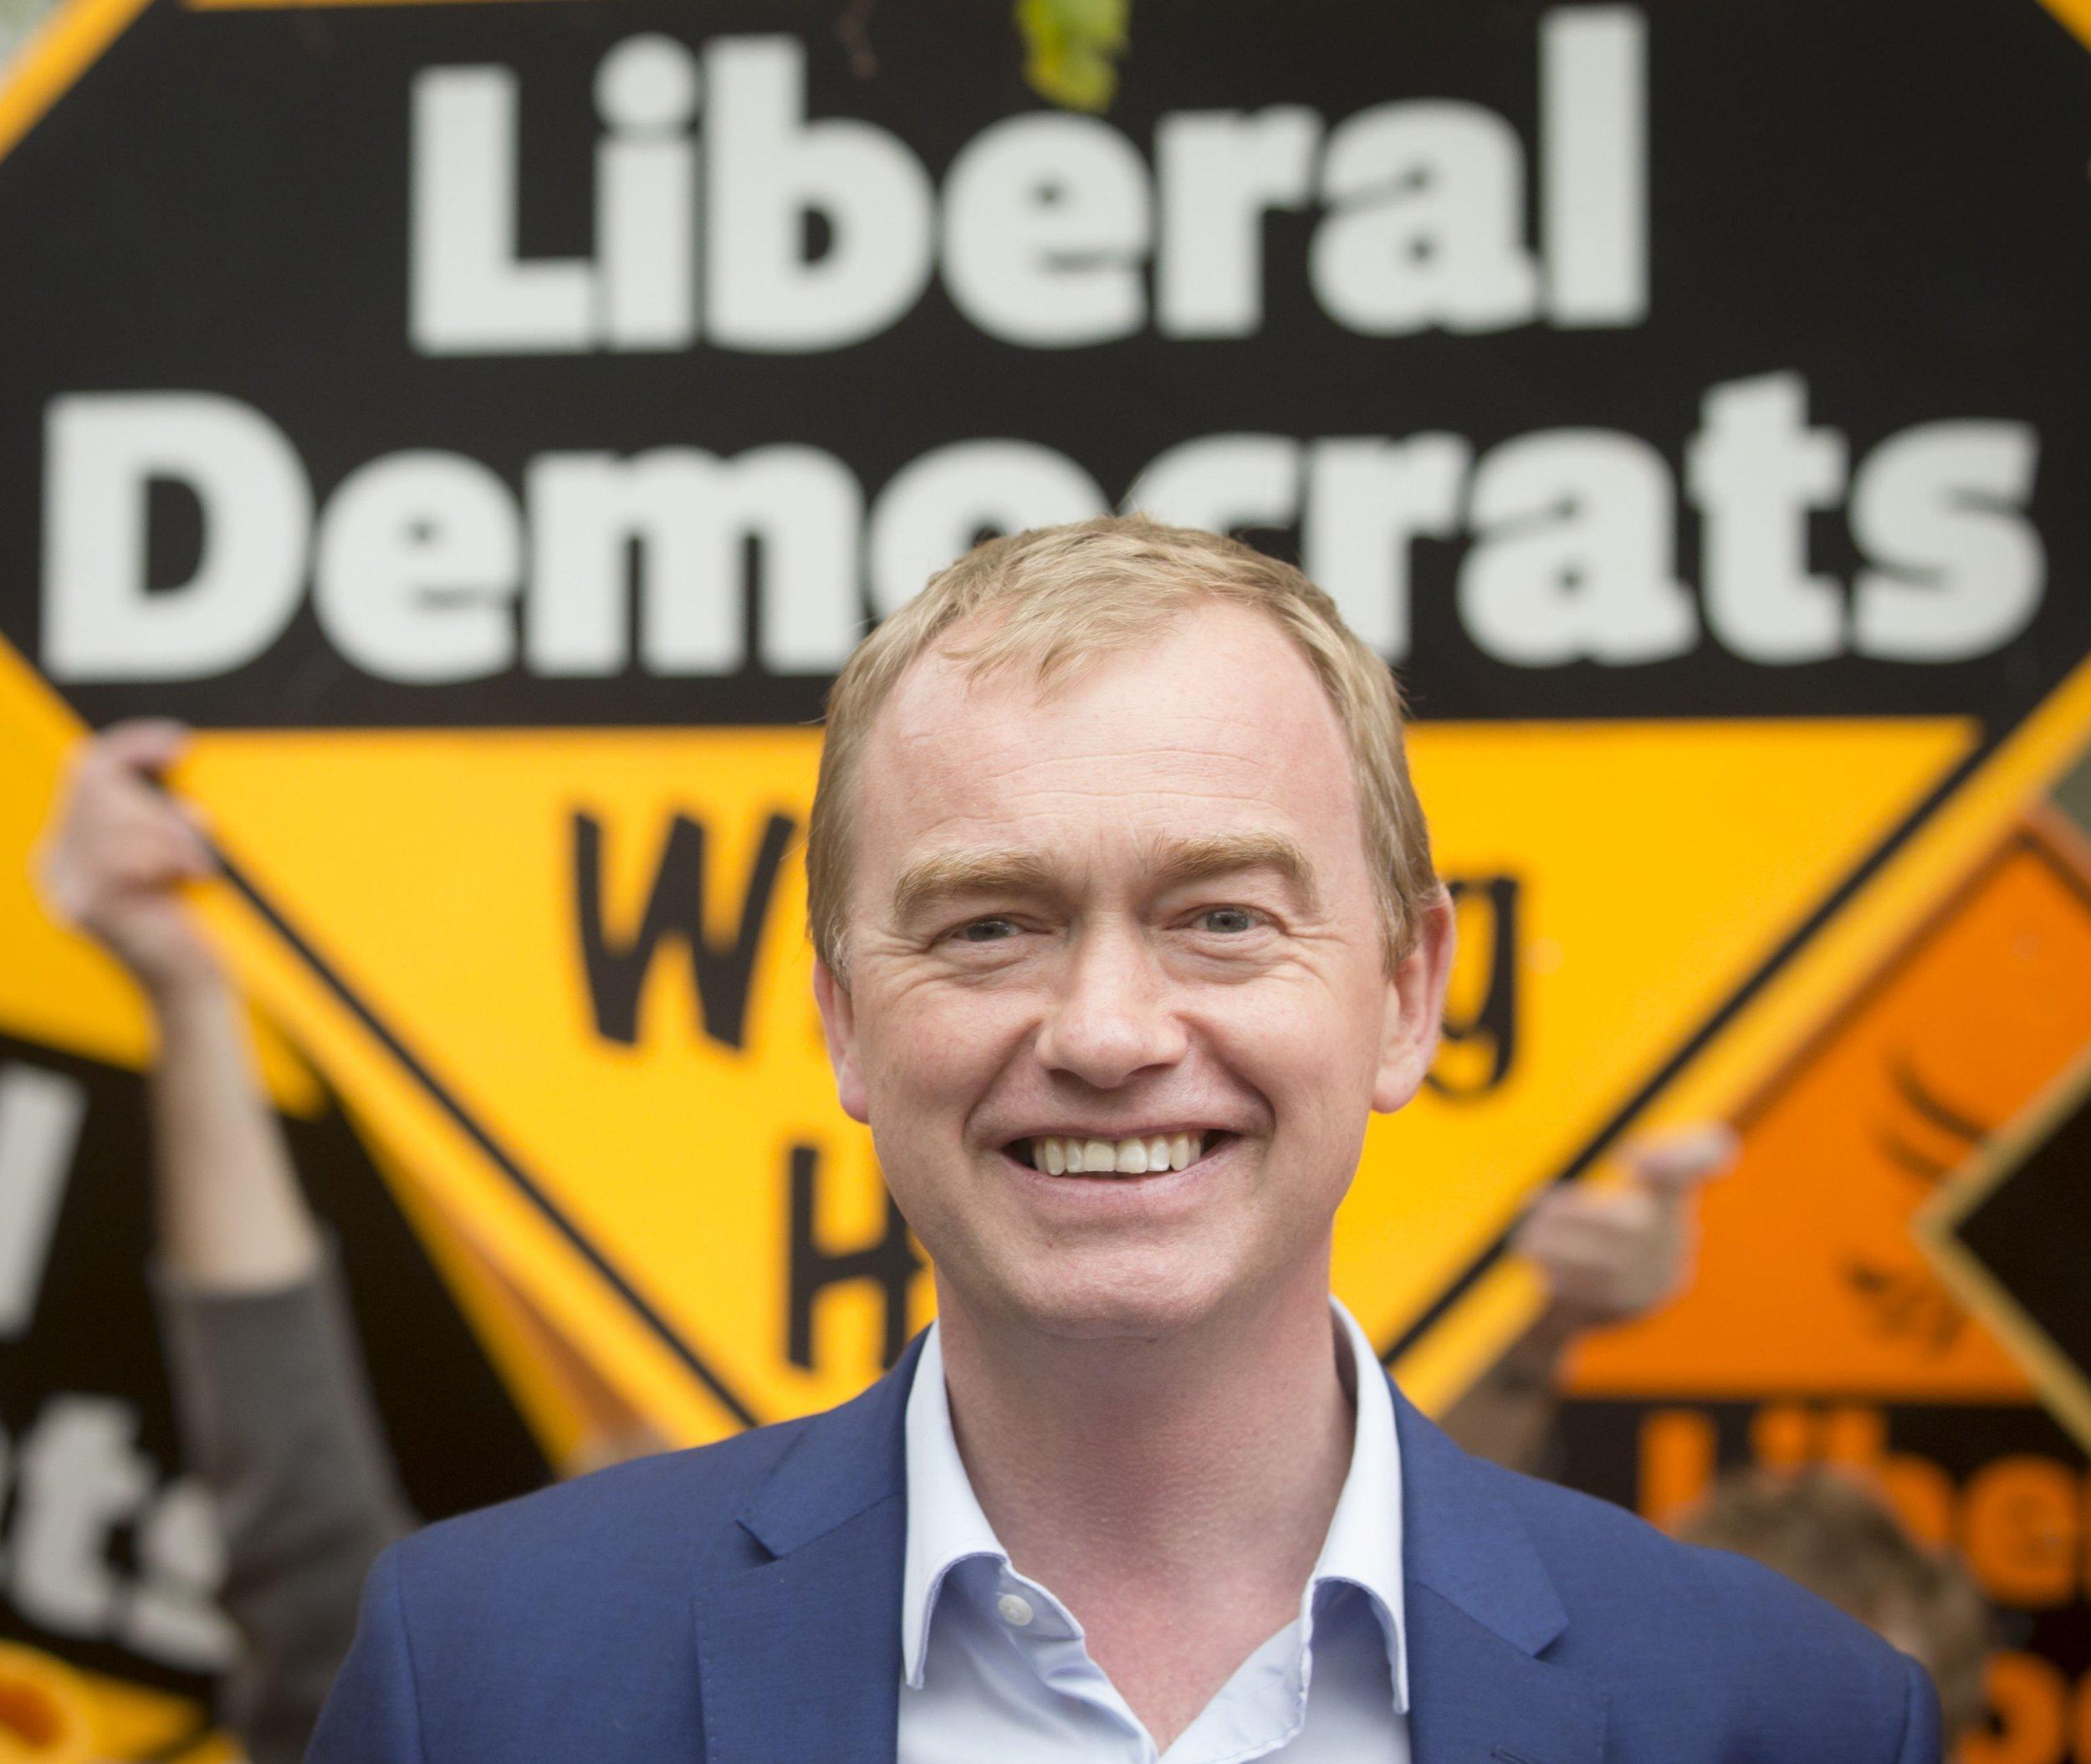 10 interesting facts about Lib Dem leader Tim Farron